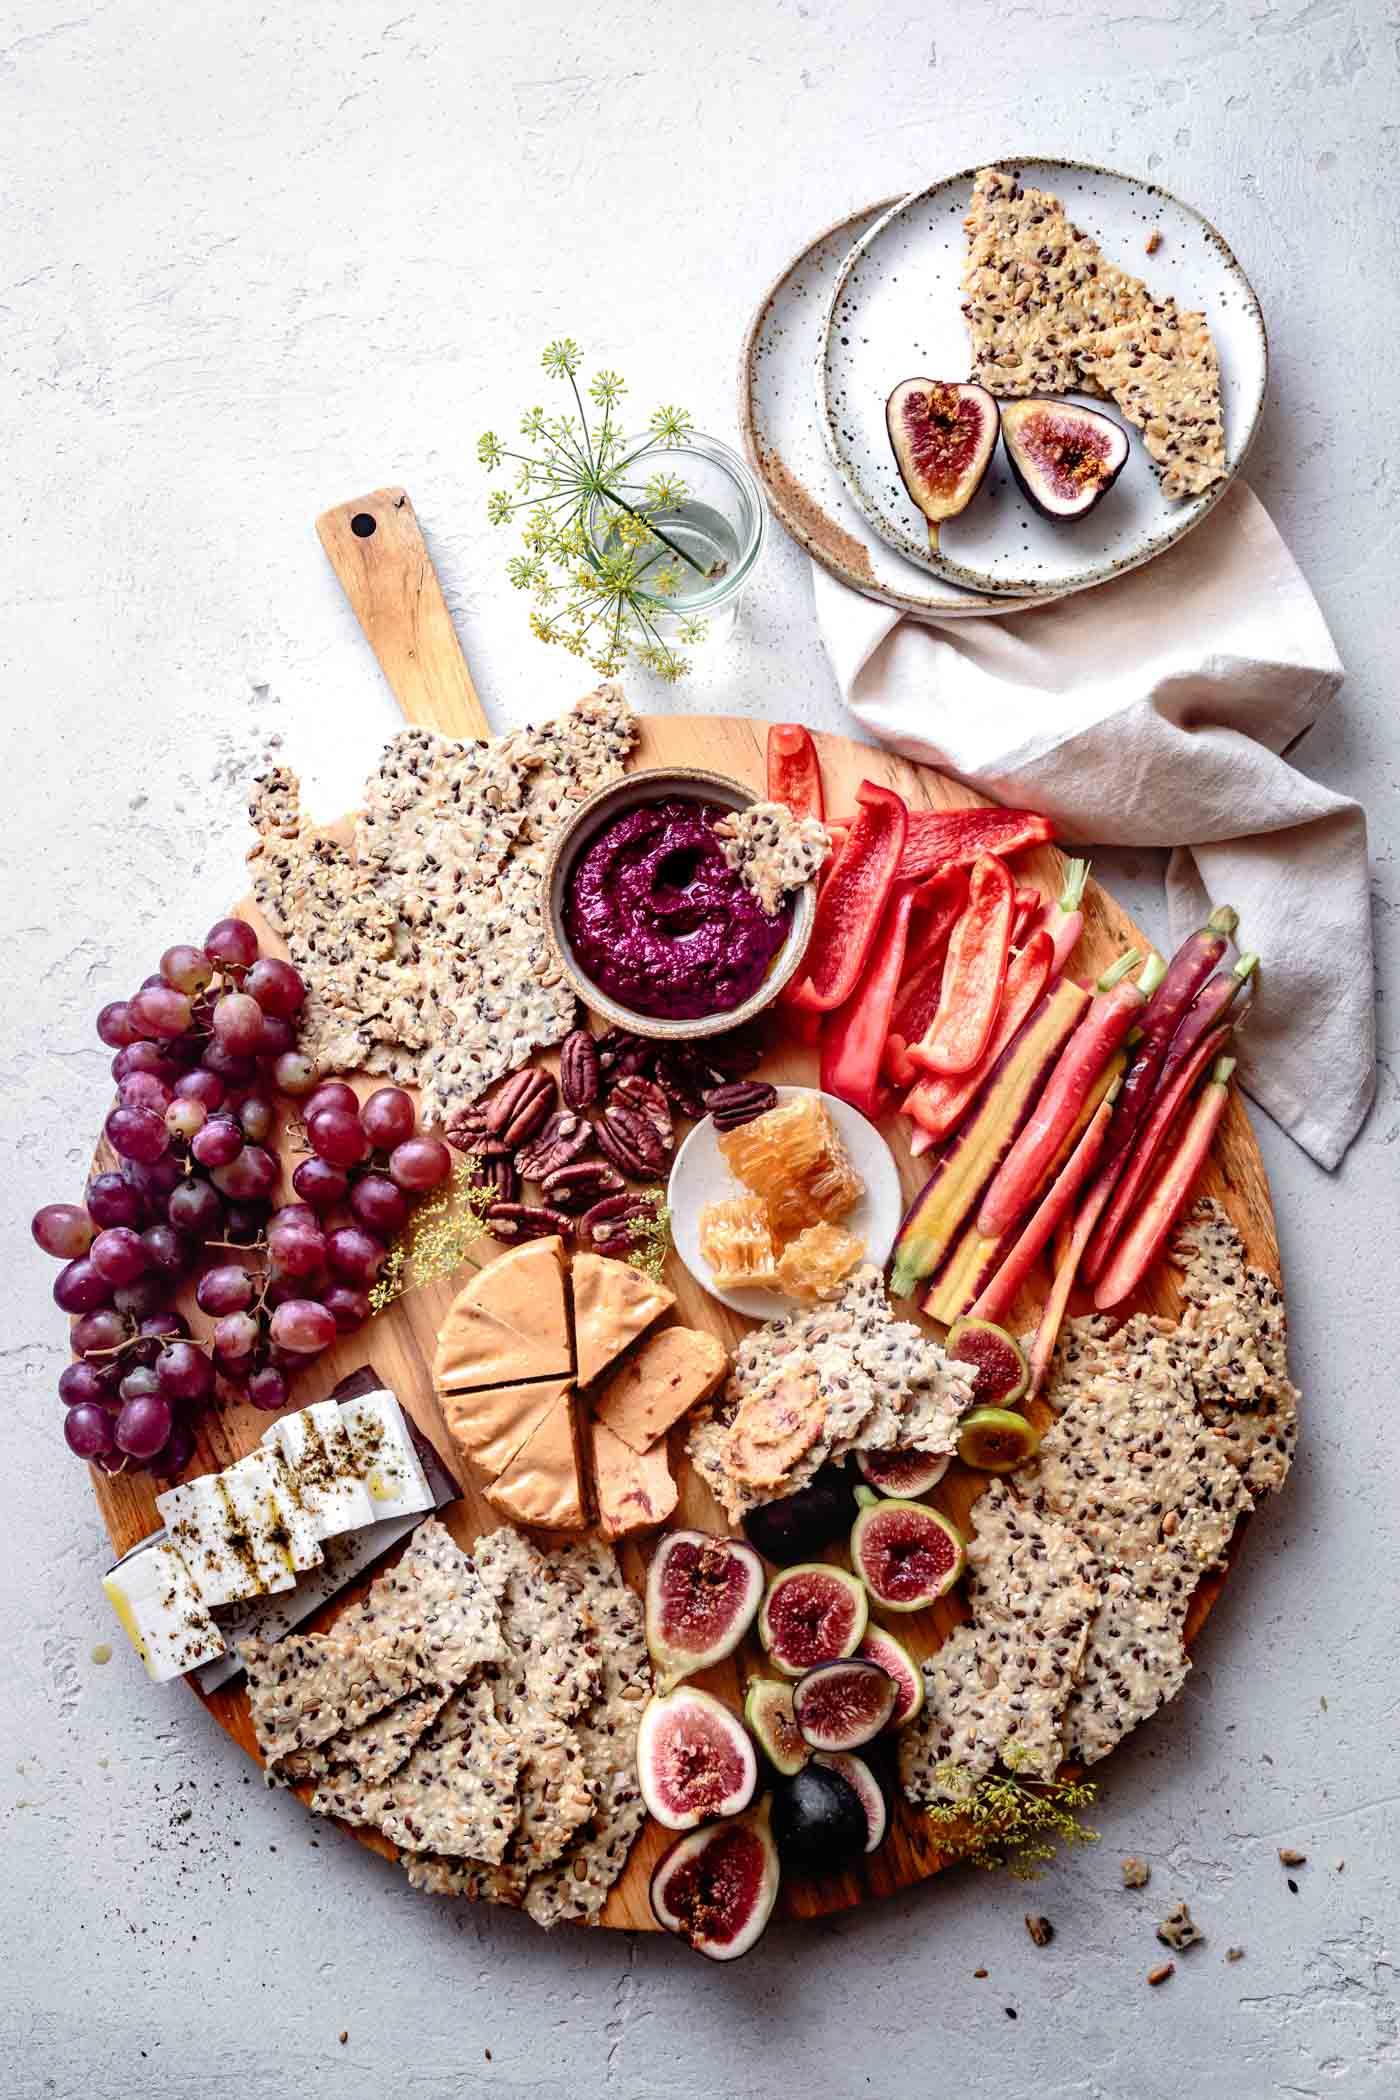 vegan cheeseboard with cassava crackers